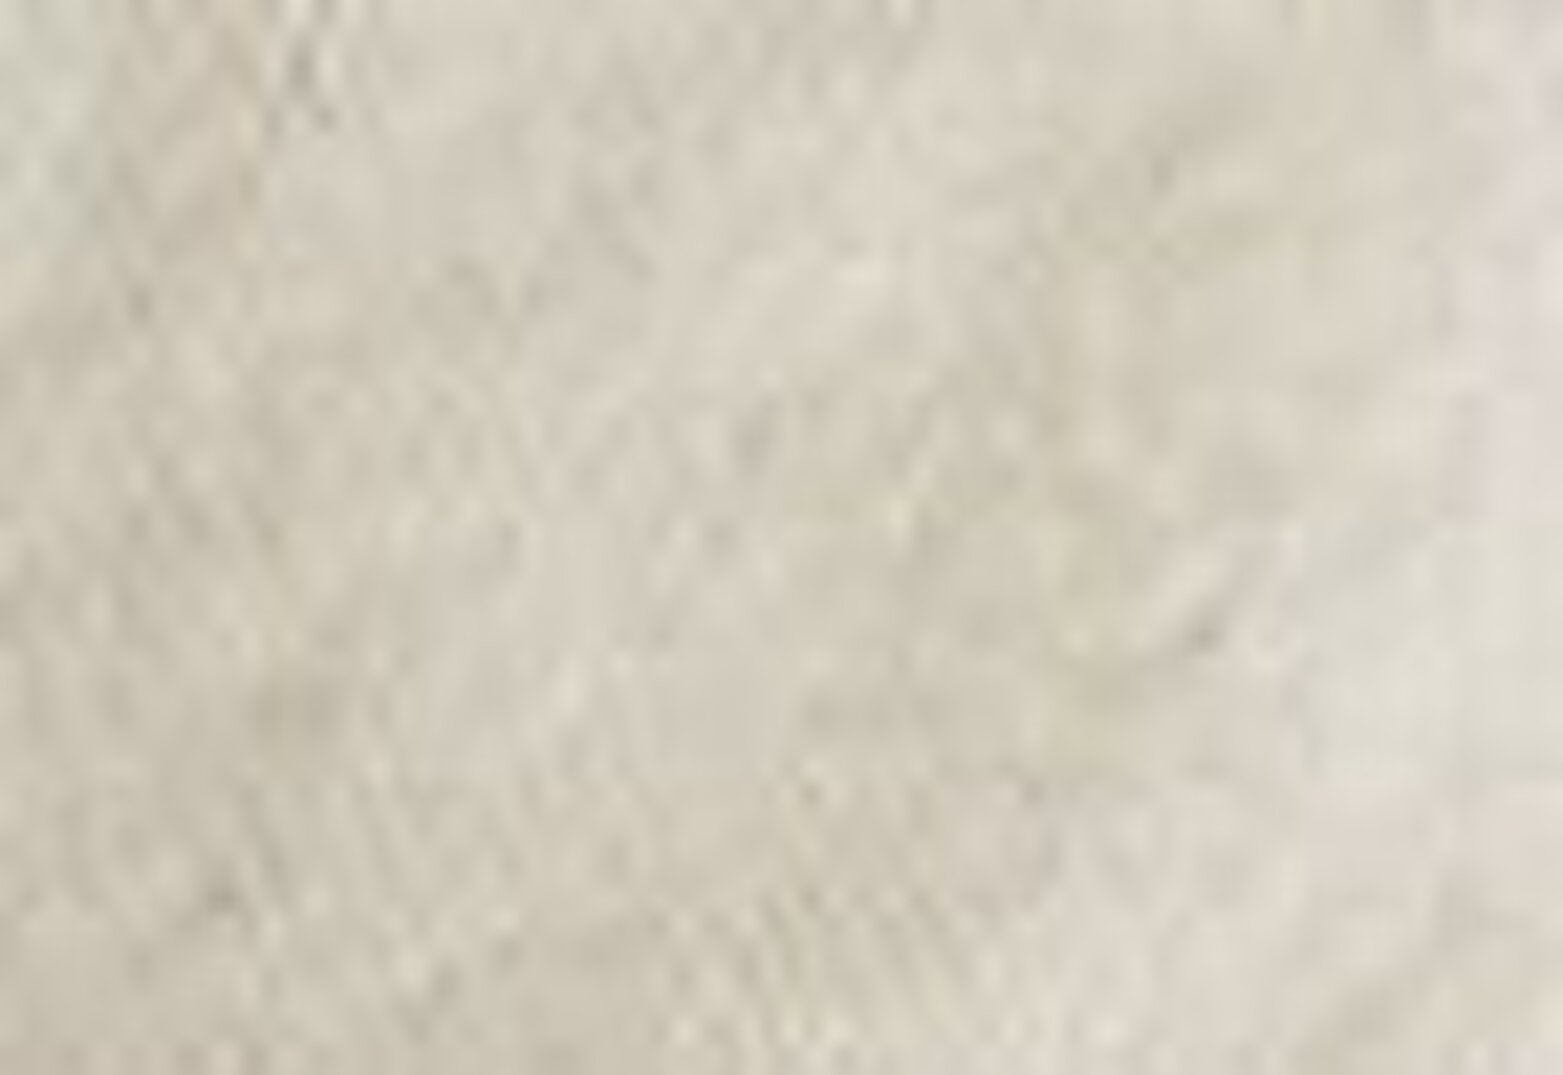 Wellthread Perfect Tee Sand Cotton Beyaz Kadın Tişört